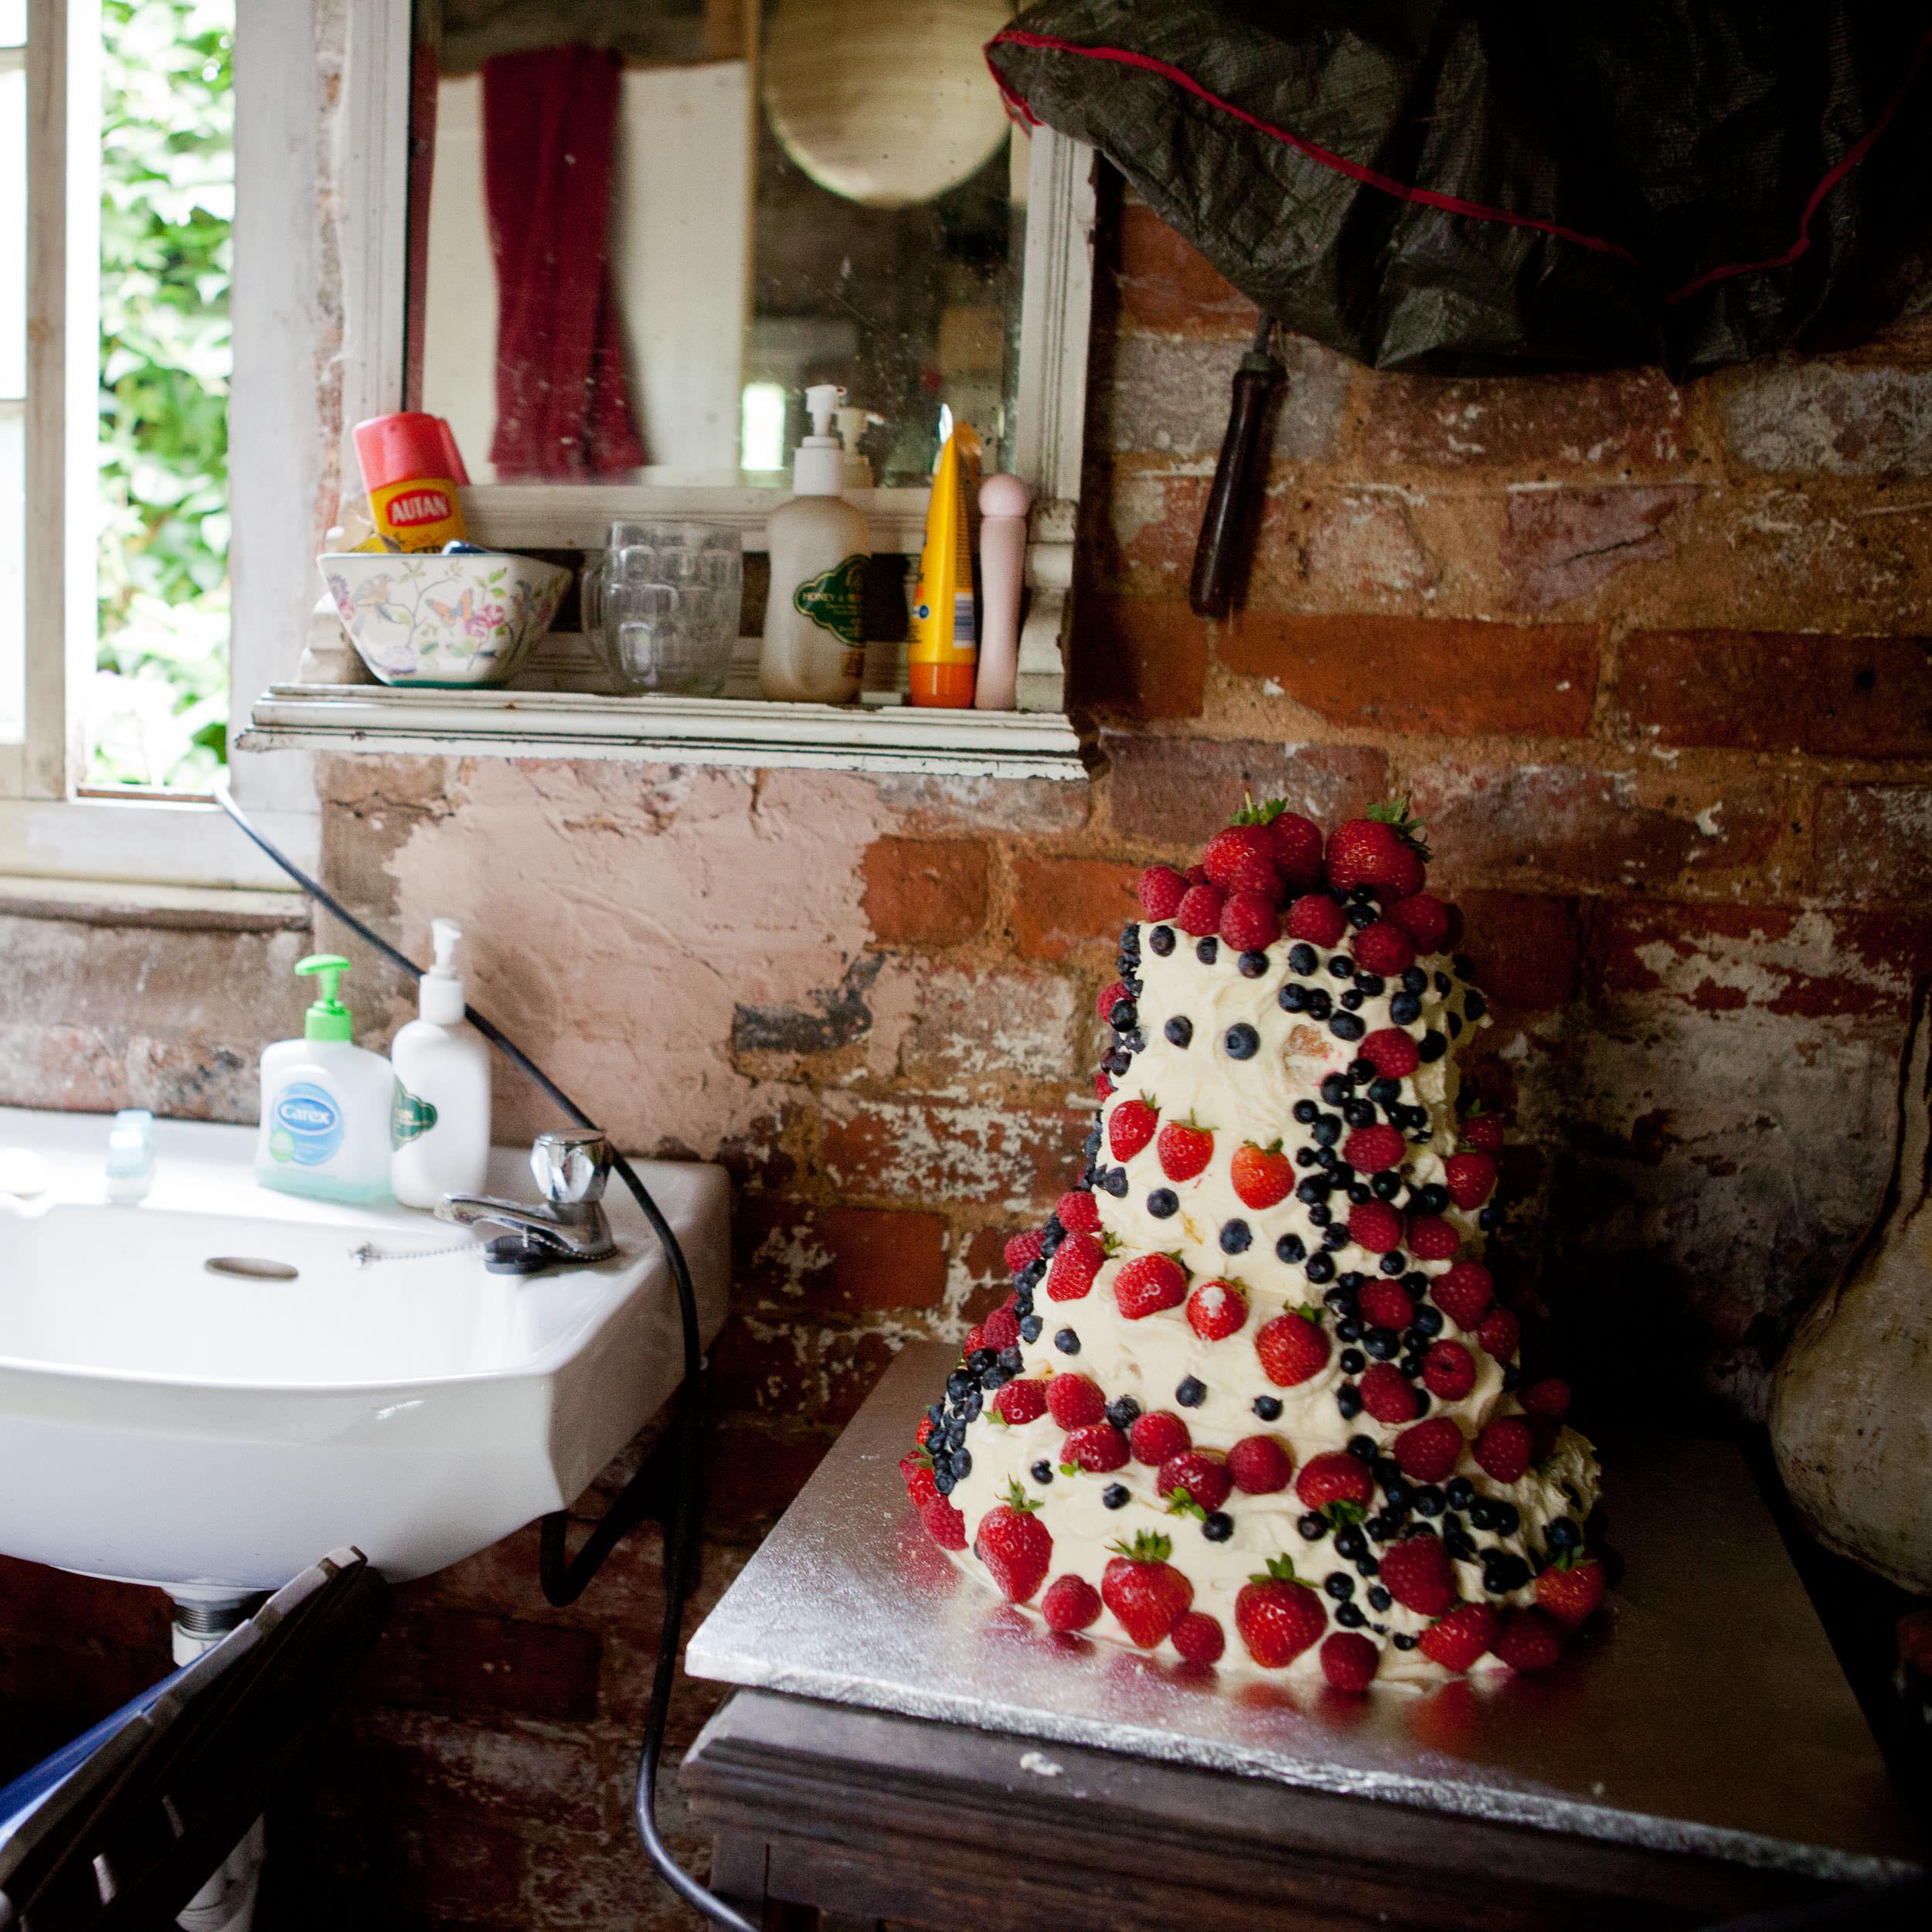 Wedding Photographer La Rioja Basque Country Spain - James Sturcke - sturcke.org_053.jpg